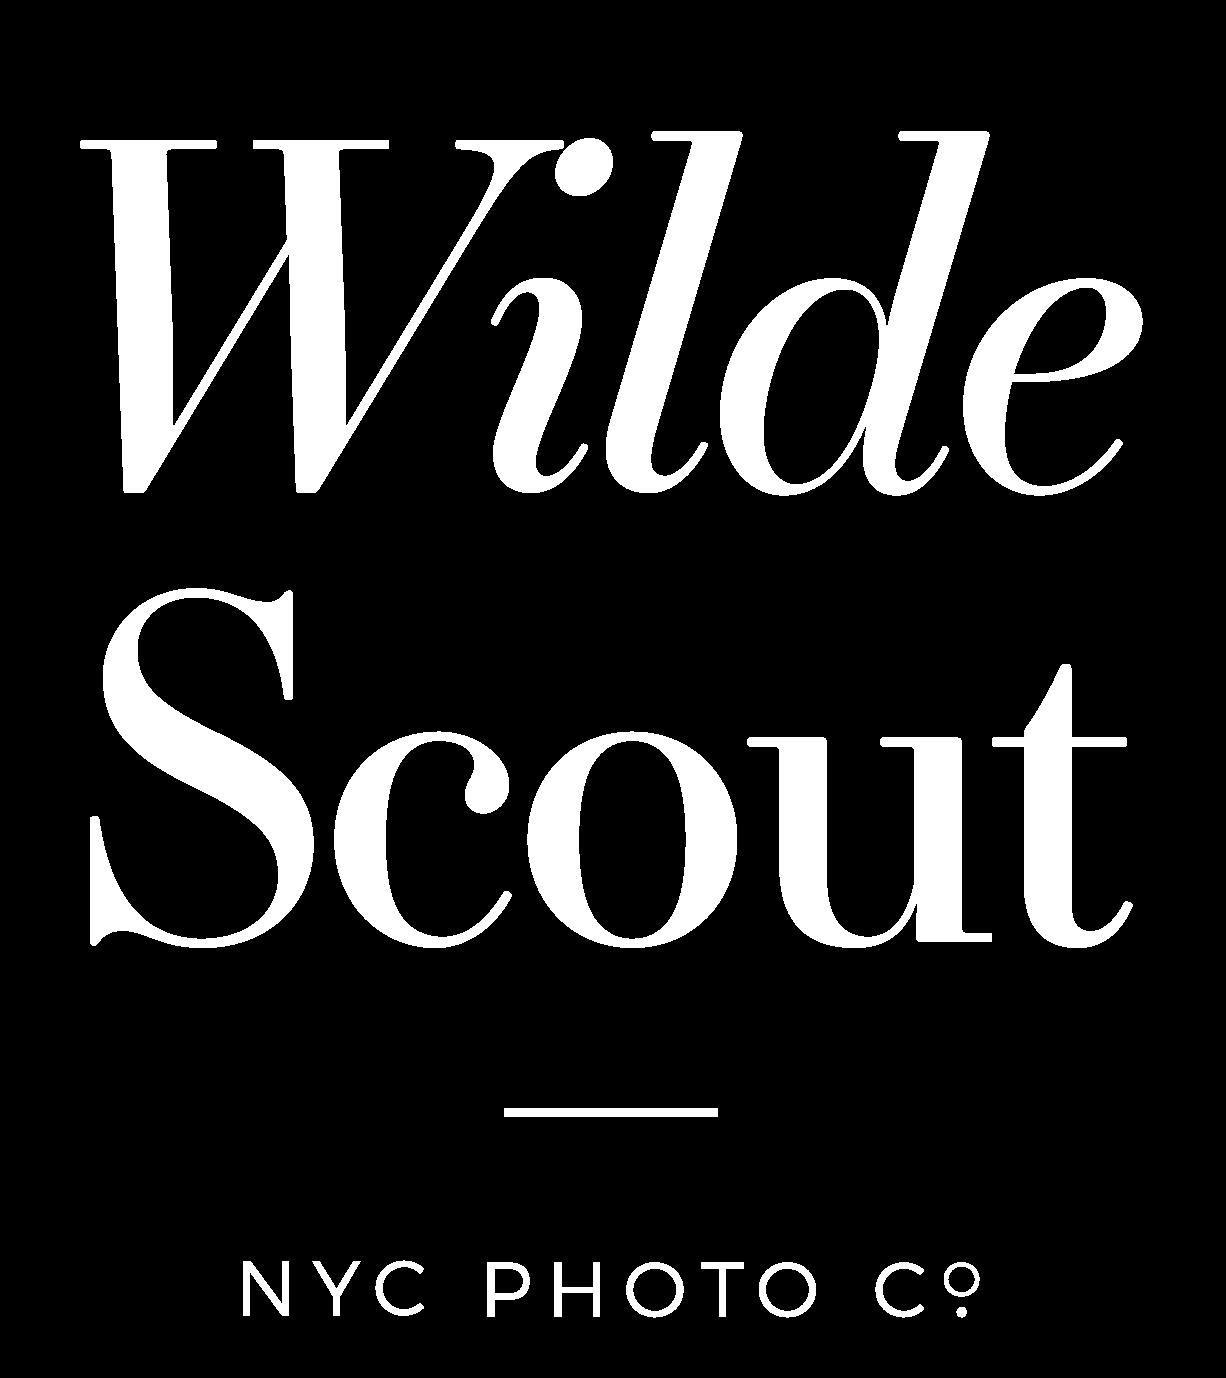 WEDDING PHOTOGRAPHER BROOKLYN NYC // WILDE SCOUT